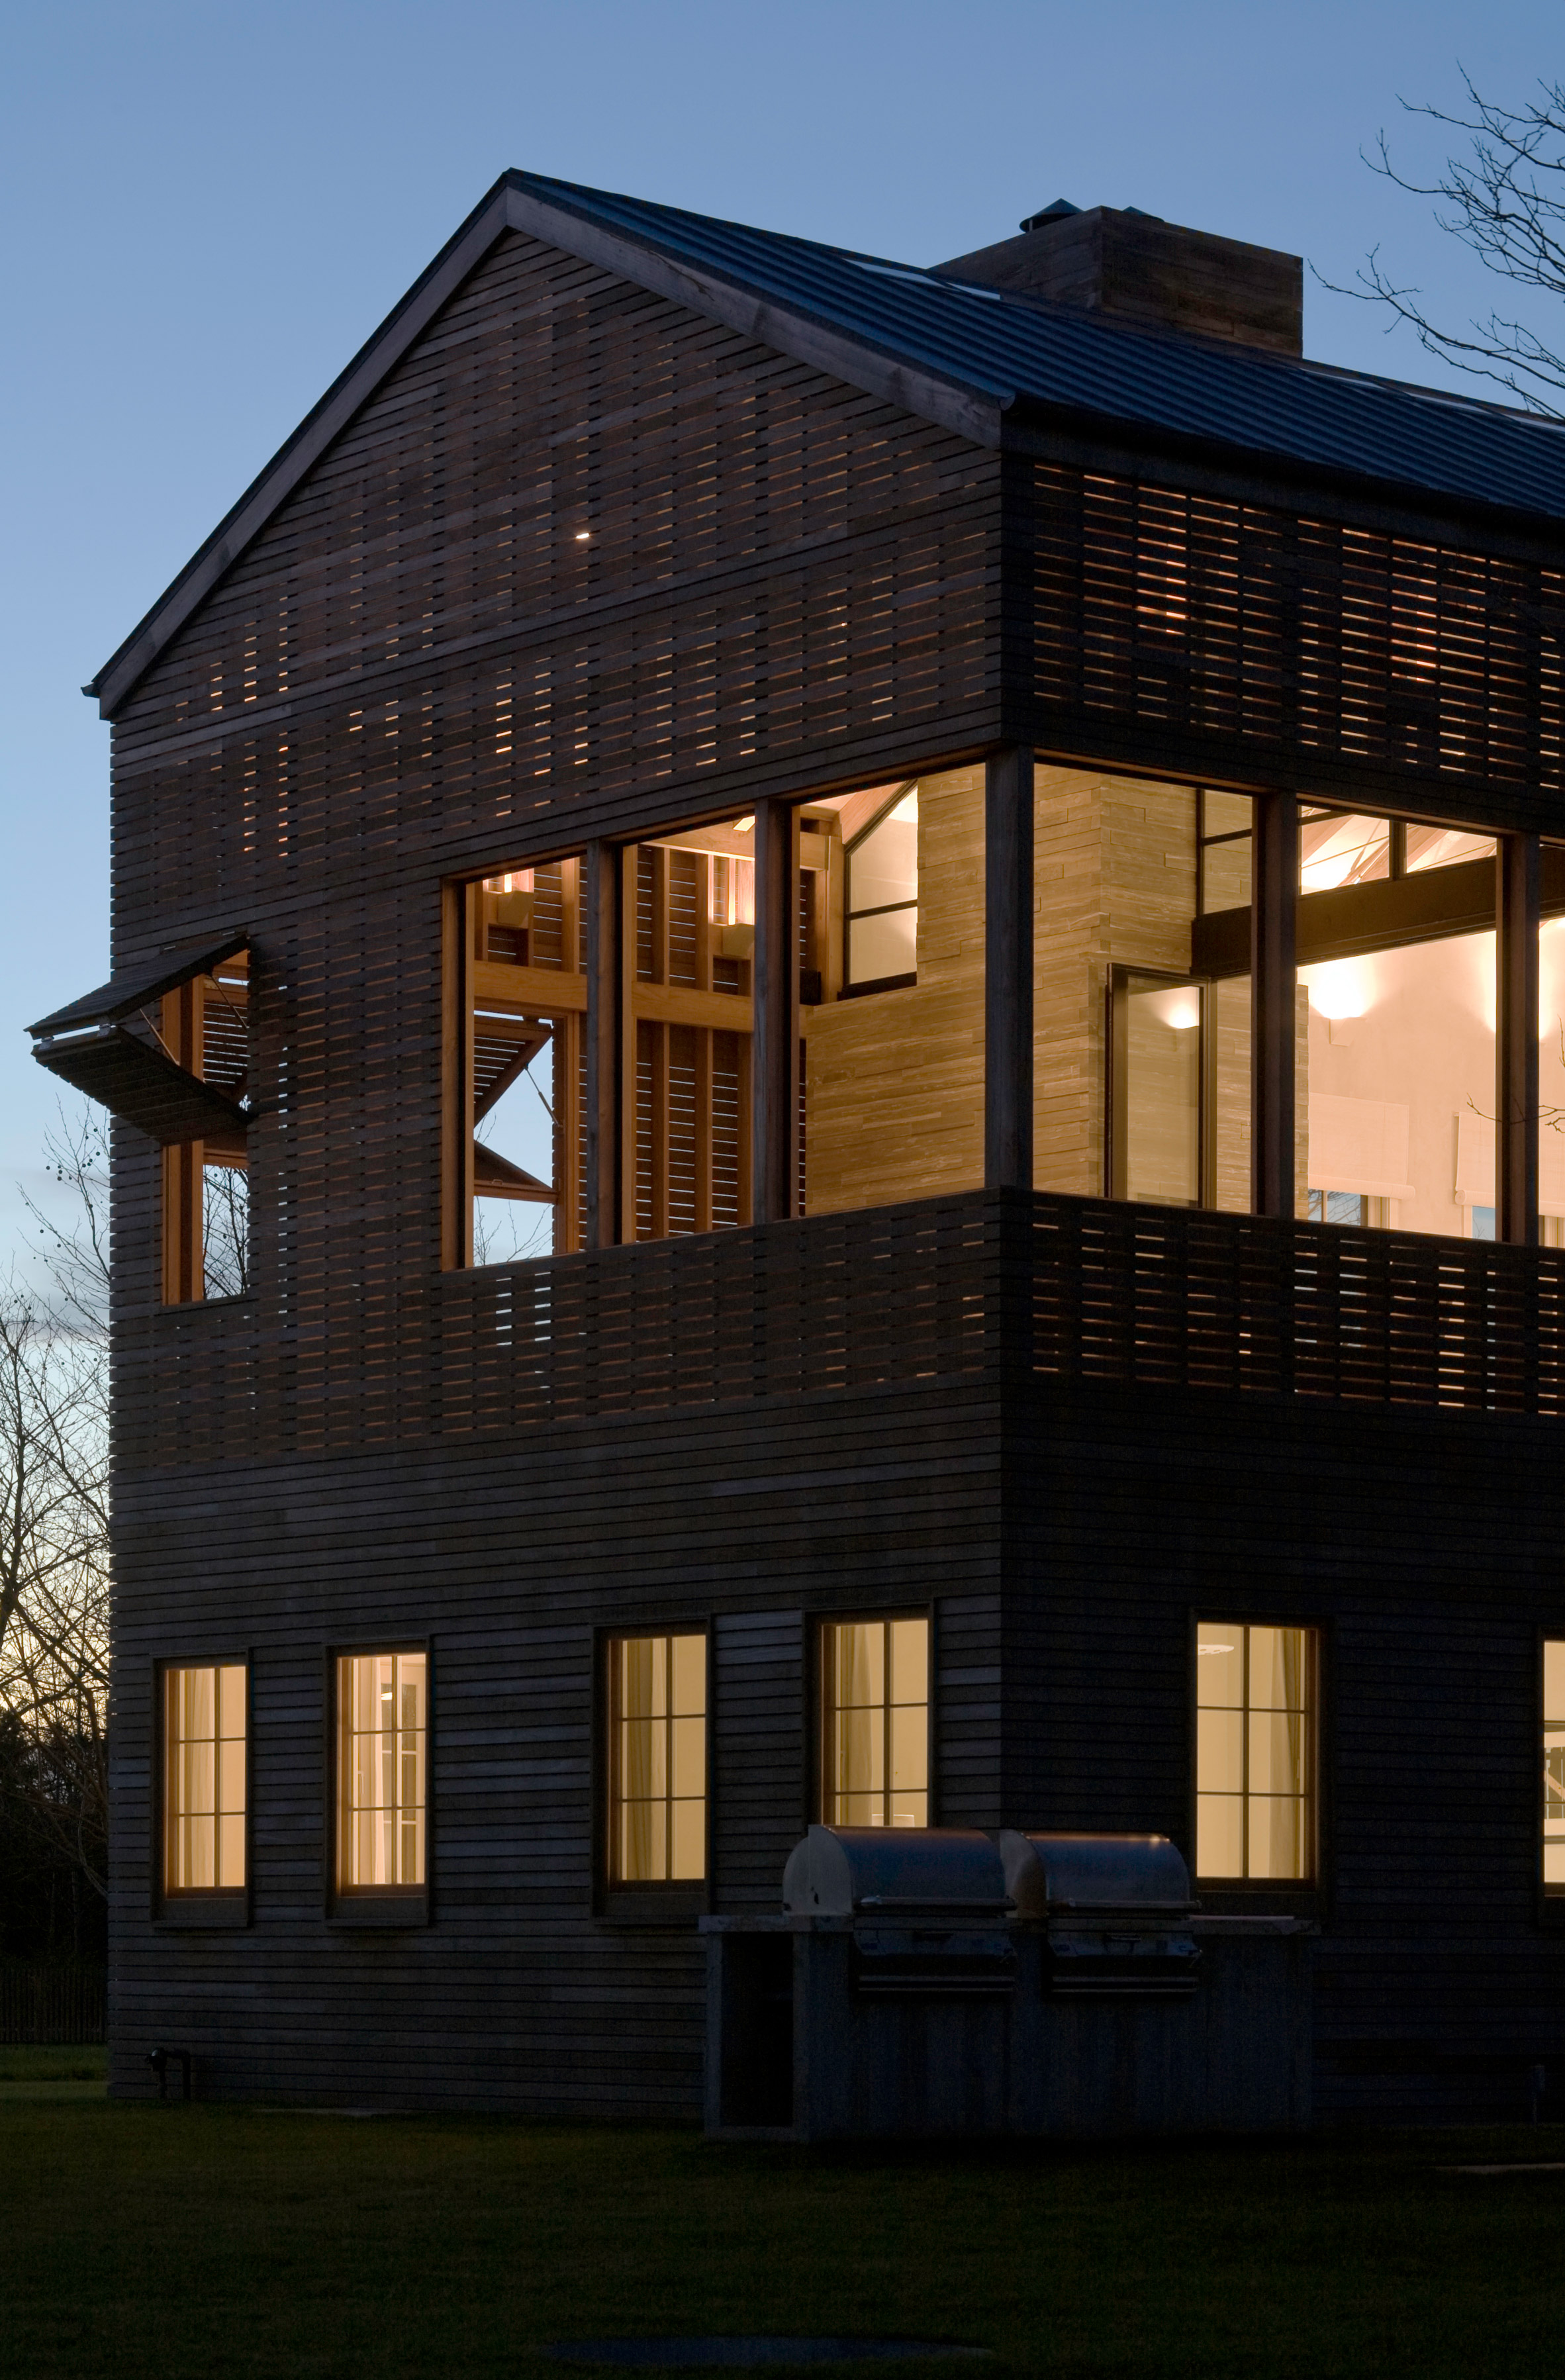 Louver House by Leroy Street Studio